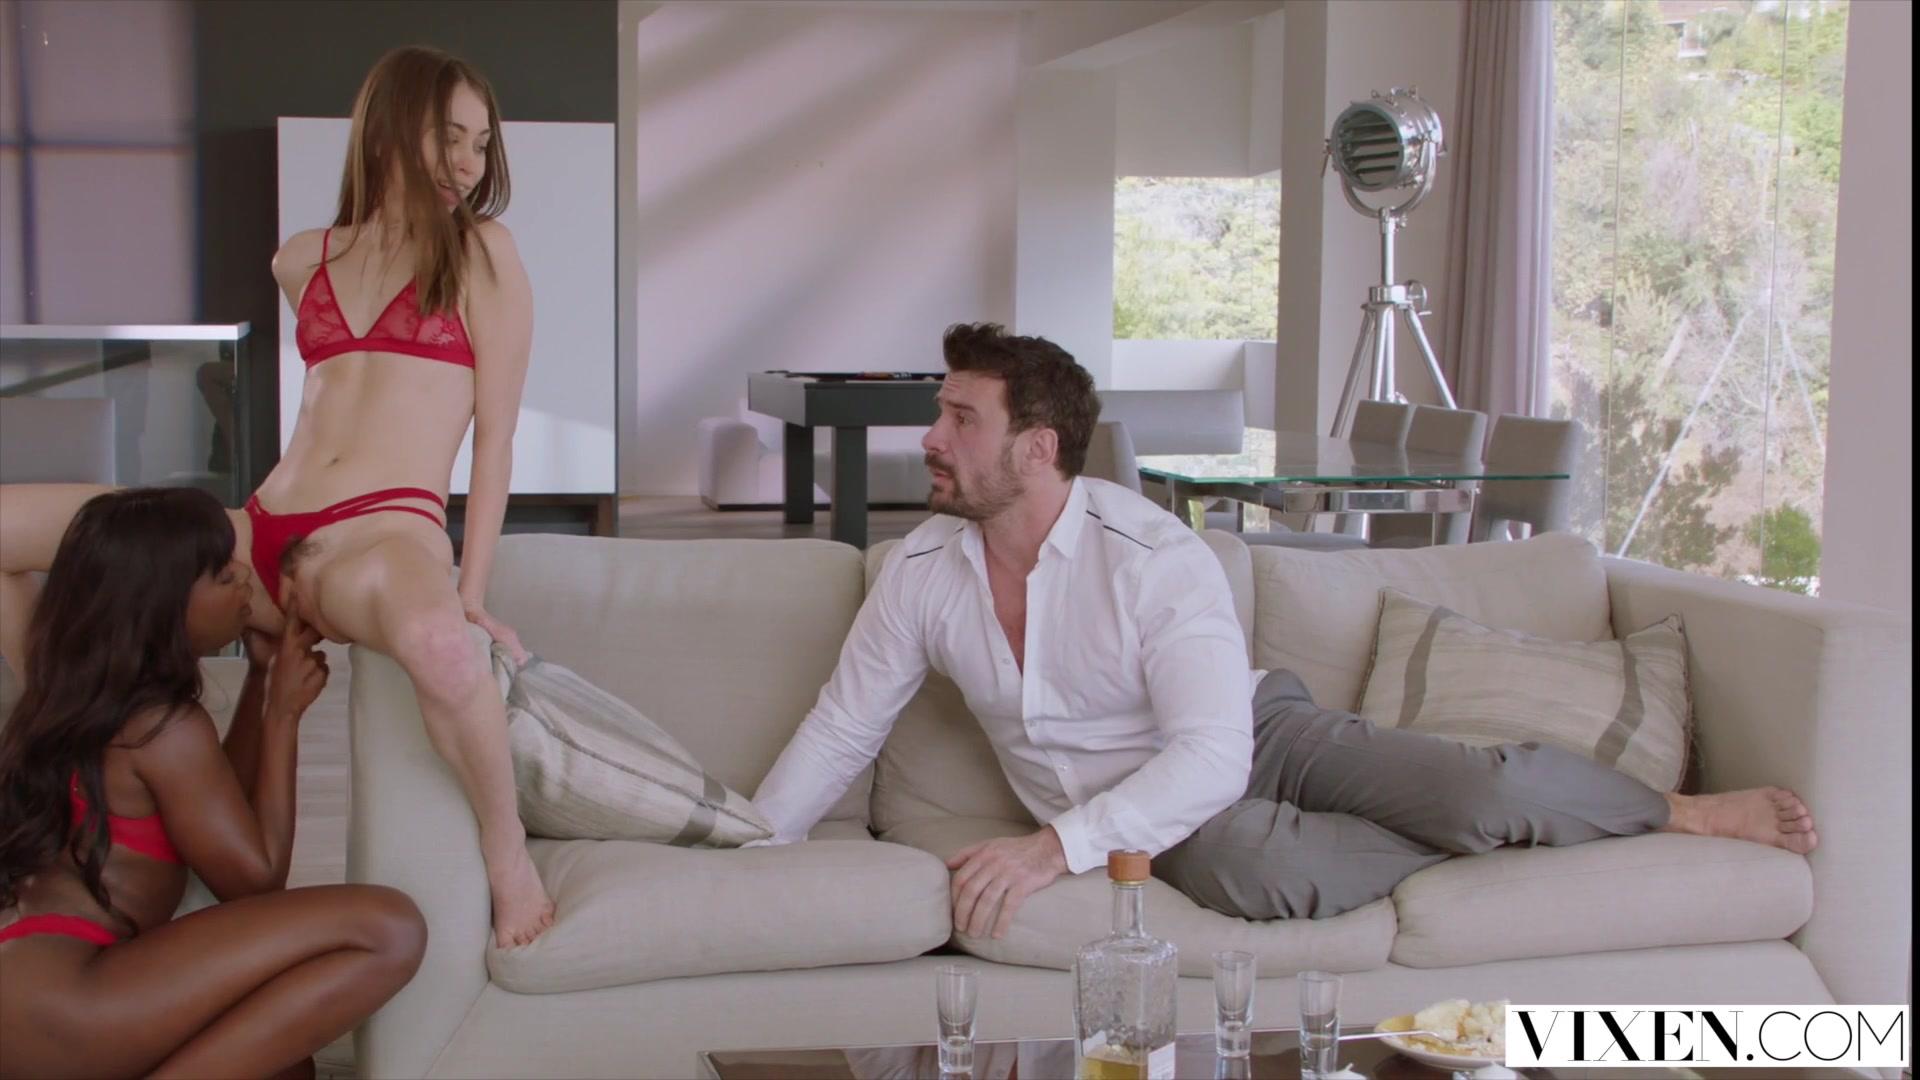 Adult striptease dinner shows in sydney Porn archive